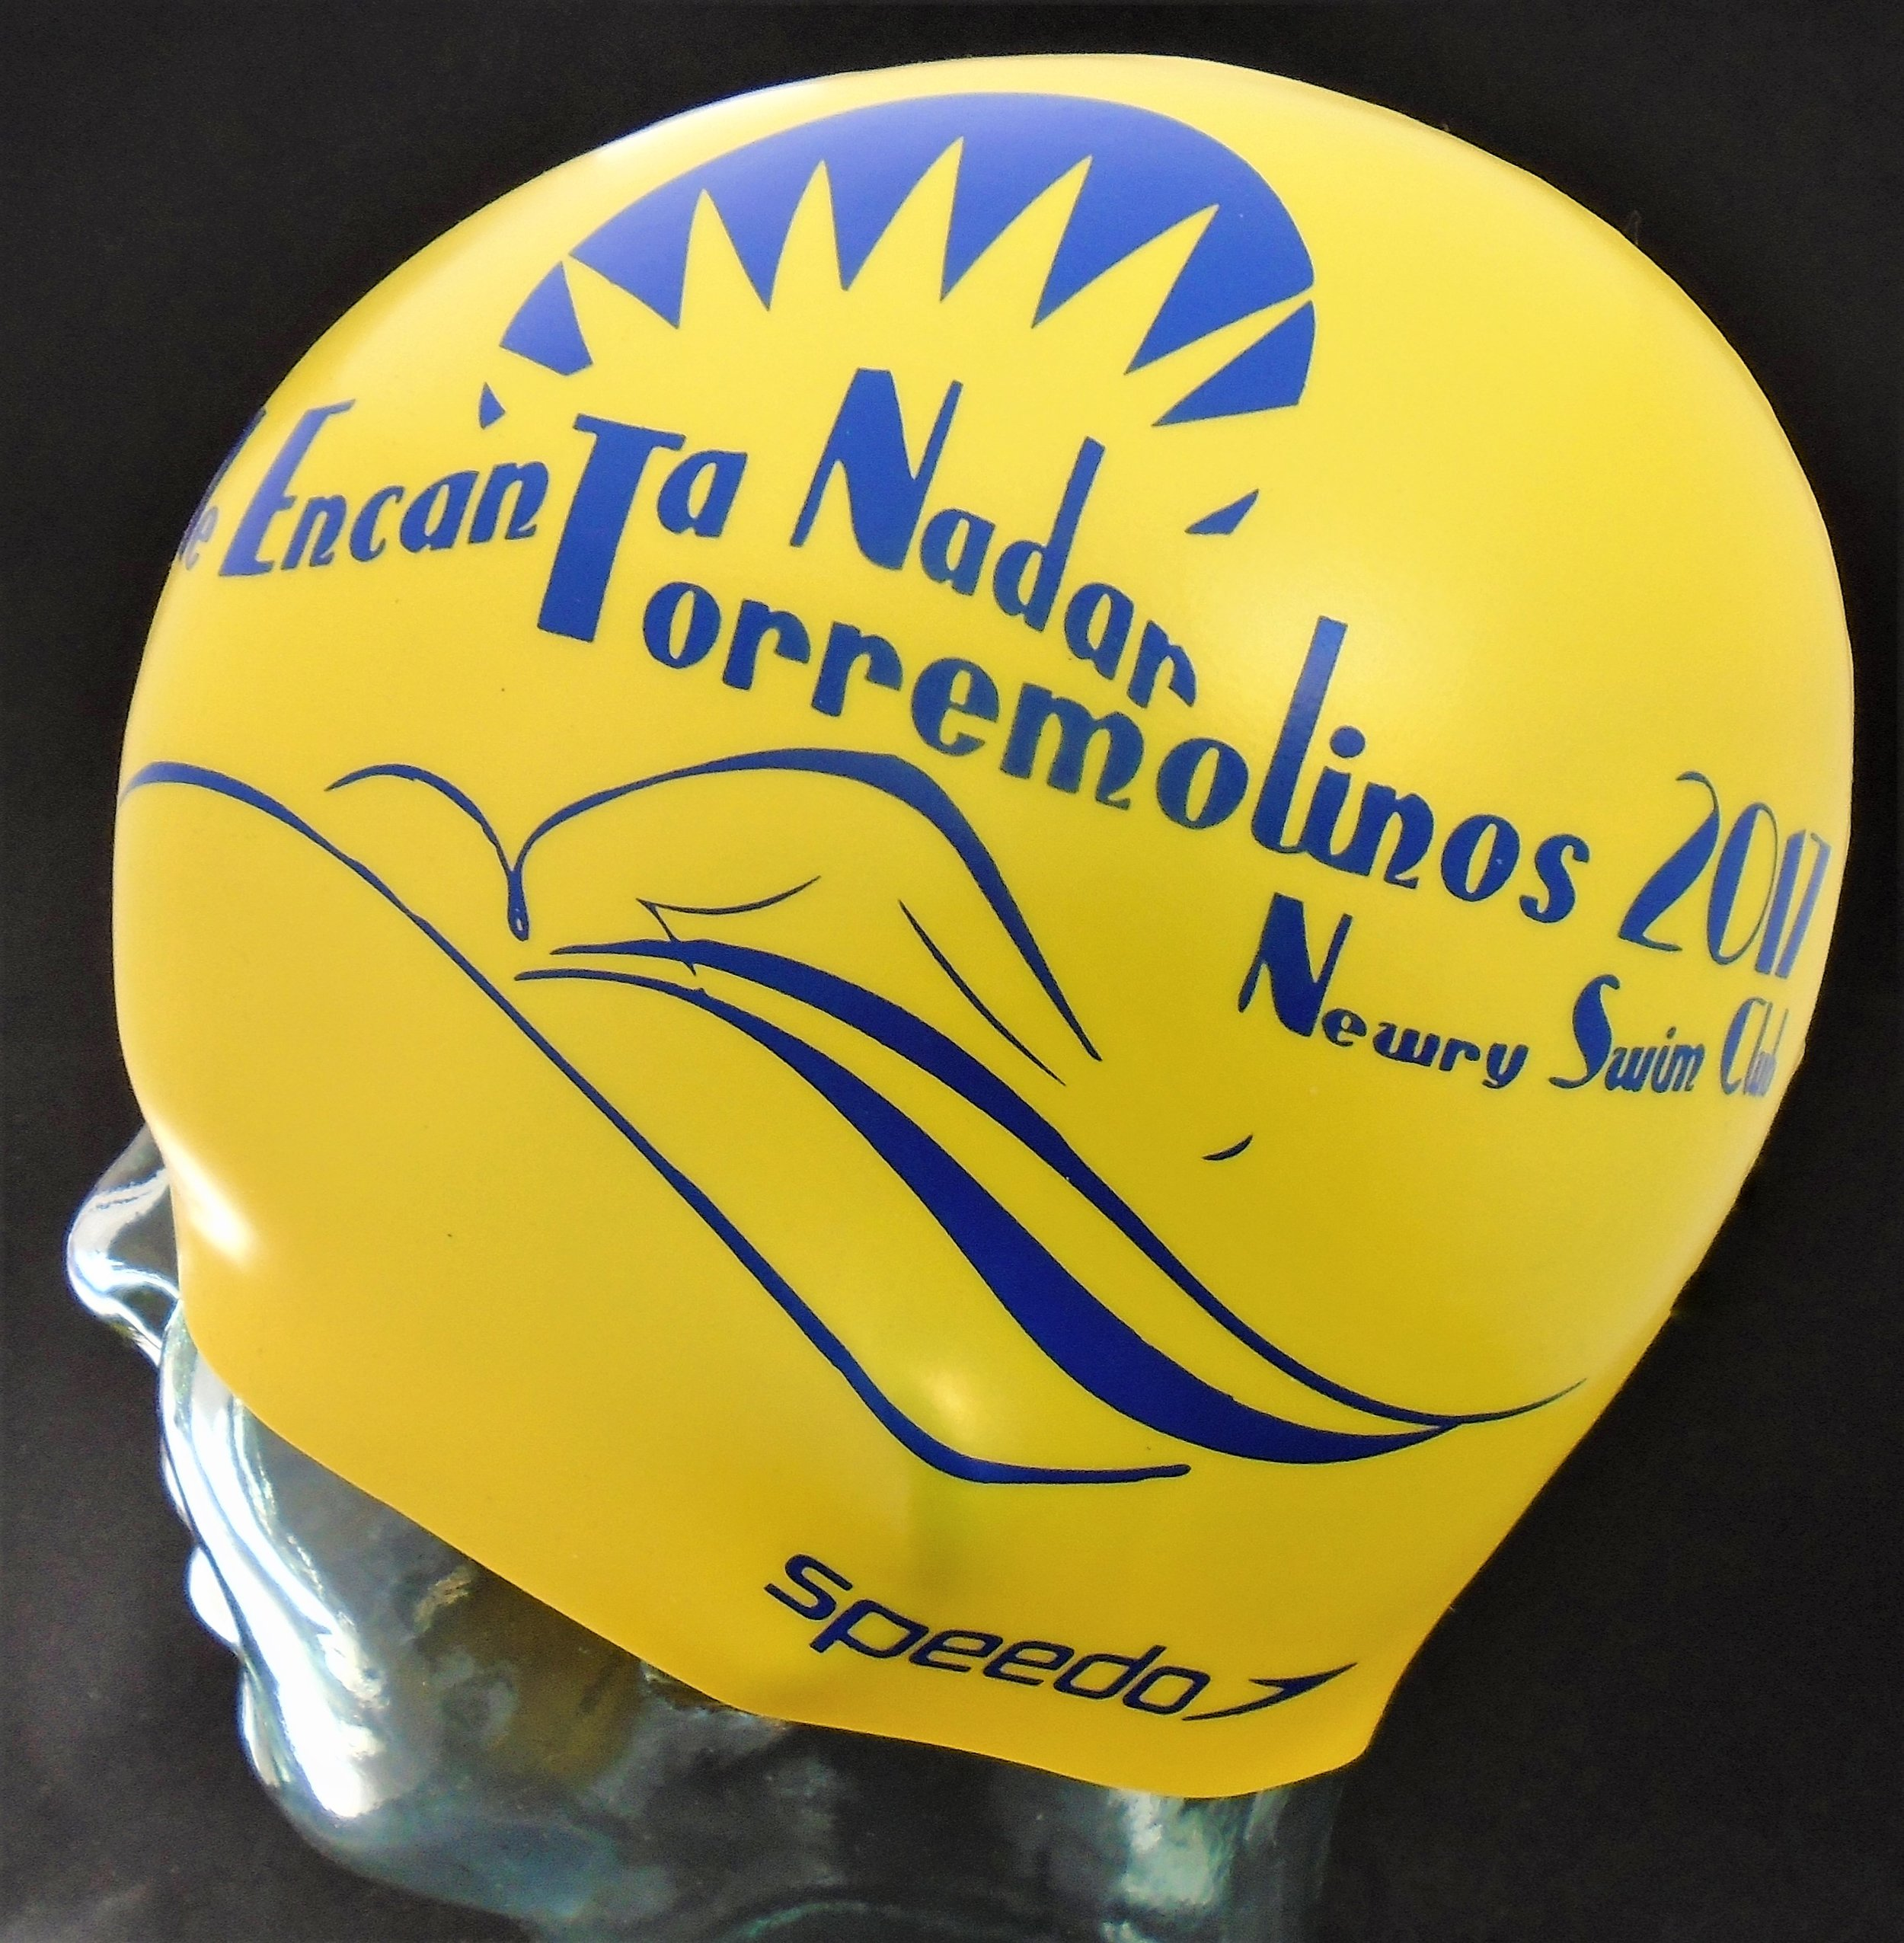 Newry SC Torremolinos 2017.jpg